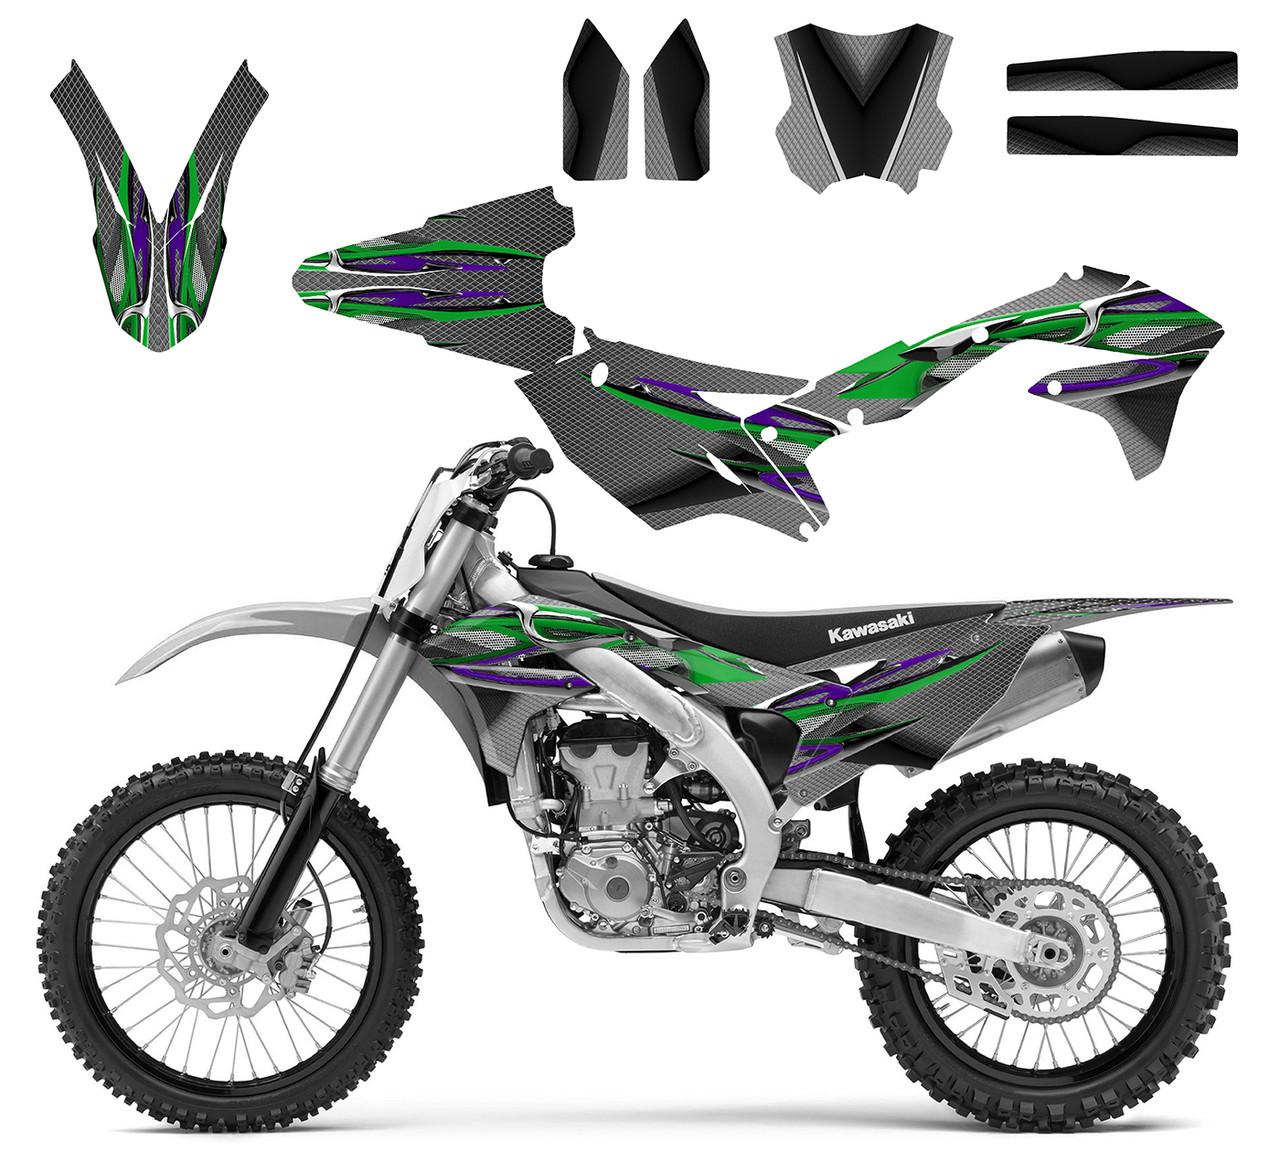 kx450f graphics kit